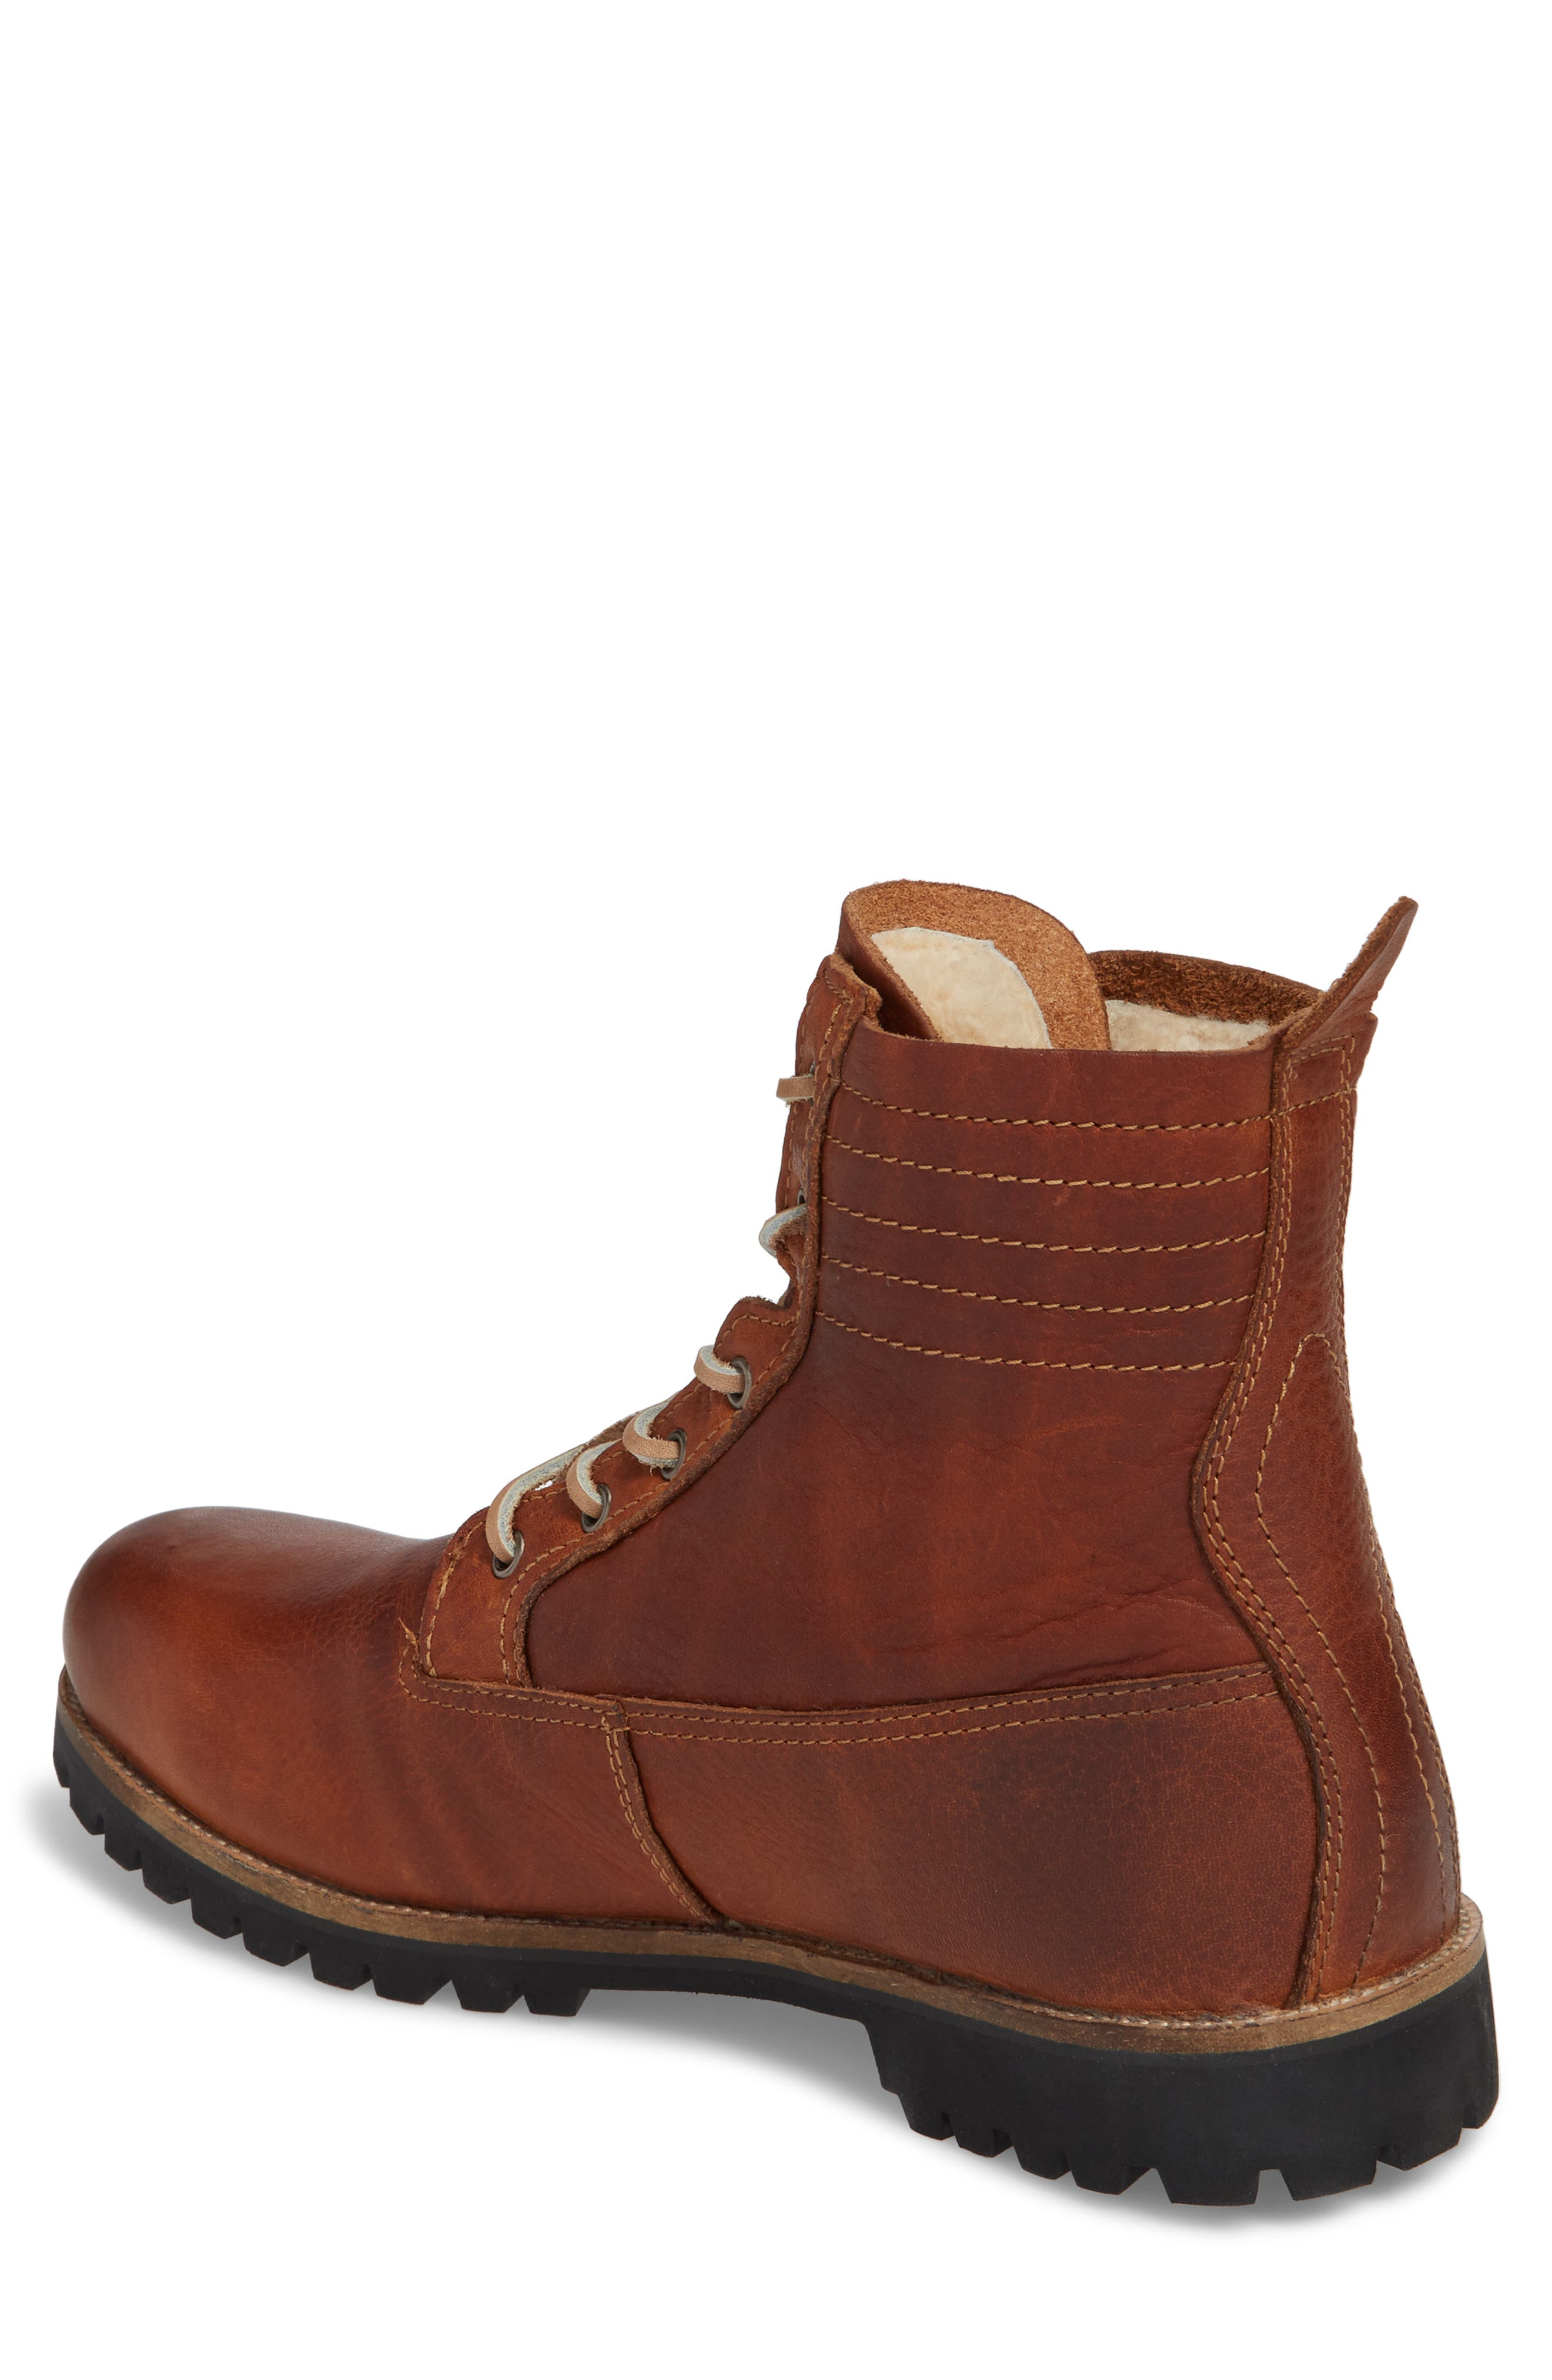 Alternate Image 2  - Blackstone IM 12 Plain Toe Boot with Genuine Shearling (Men)